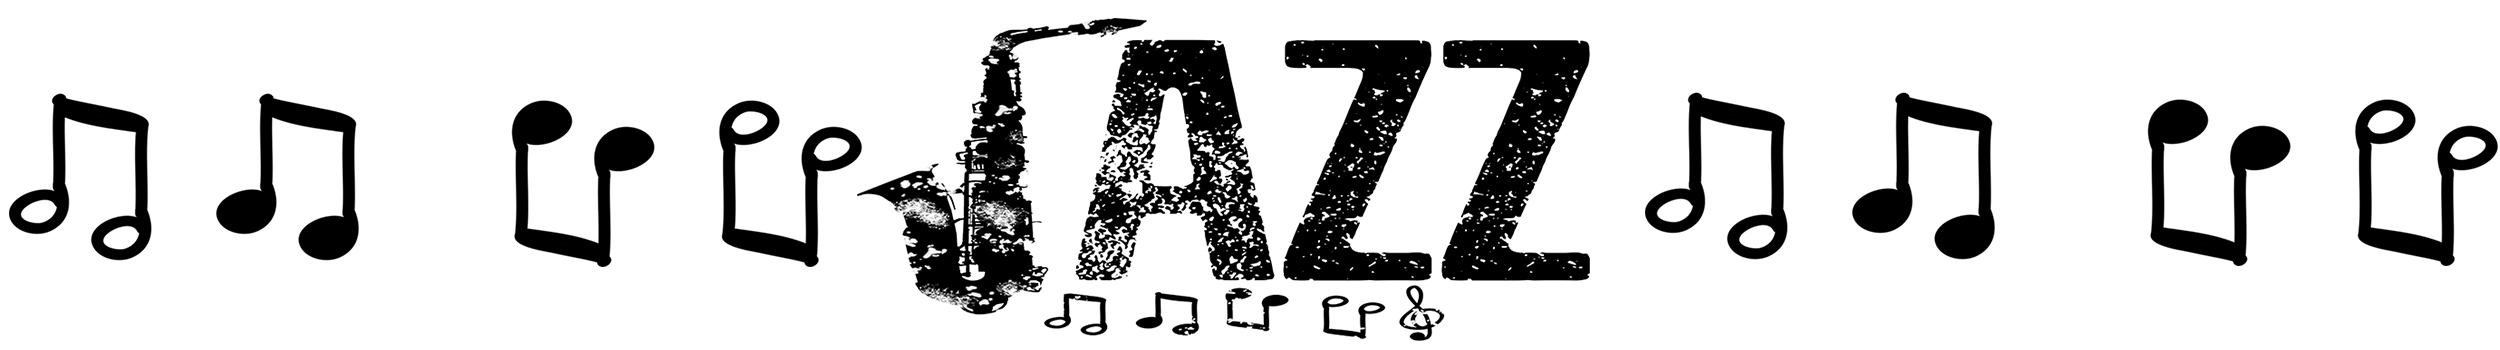 Jazzlover Shirts